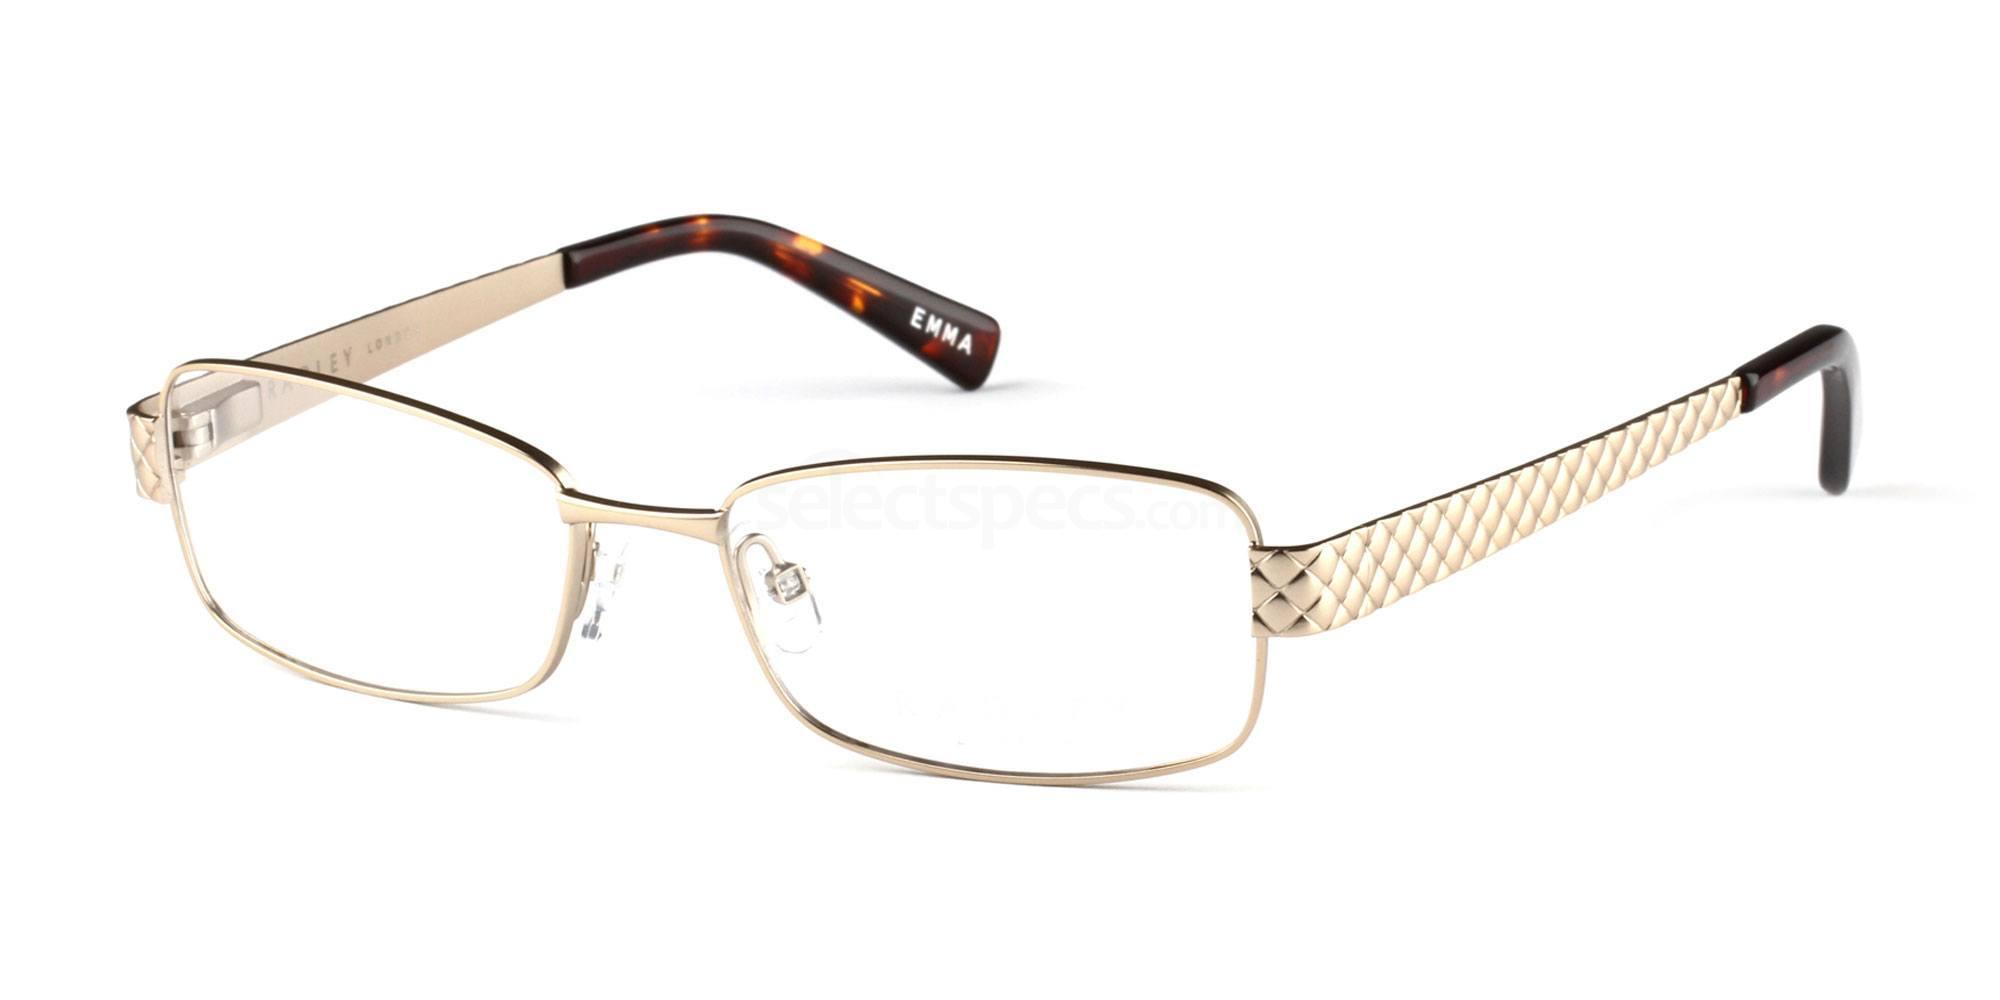 001 RDO-EMMA Glasses, Radley London